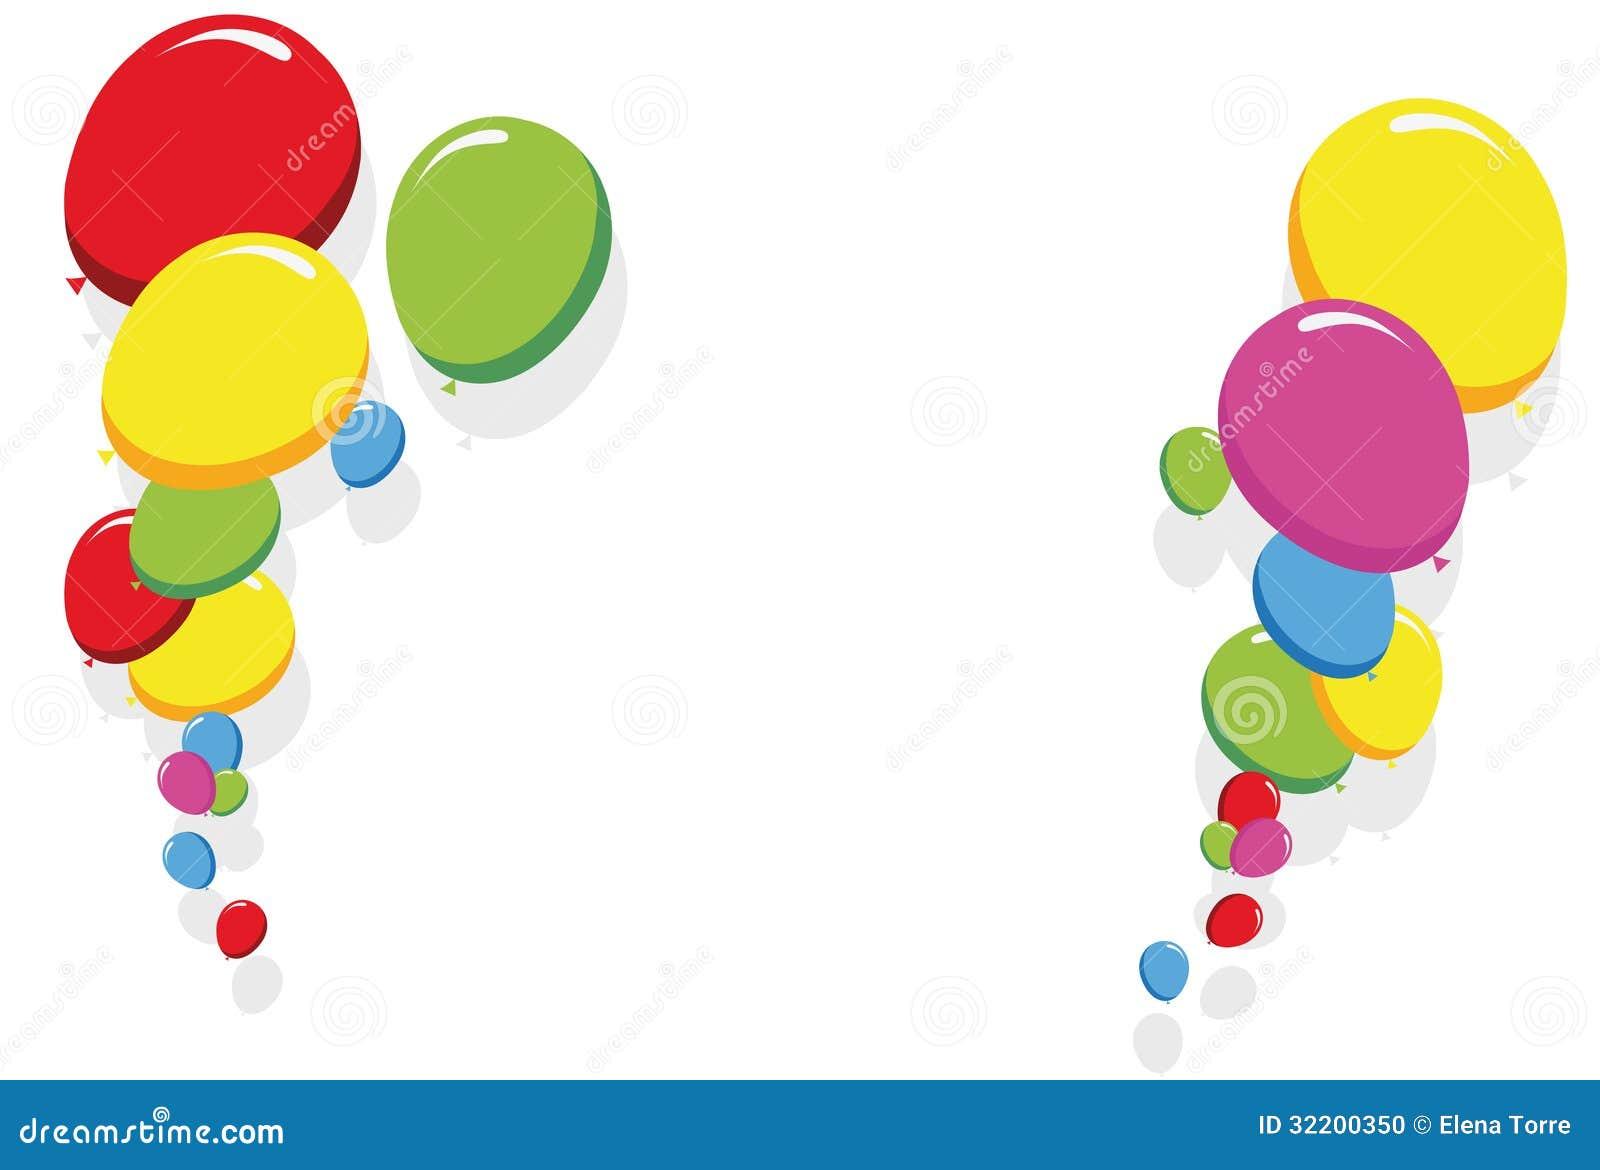 Rainbow Party Invite is great invitations sample